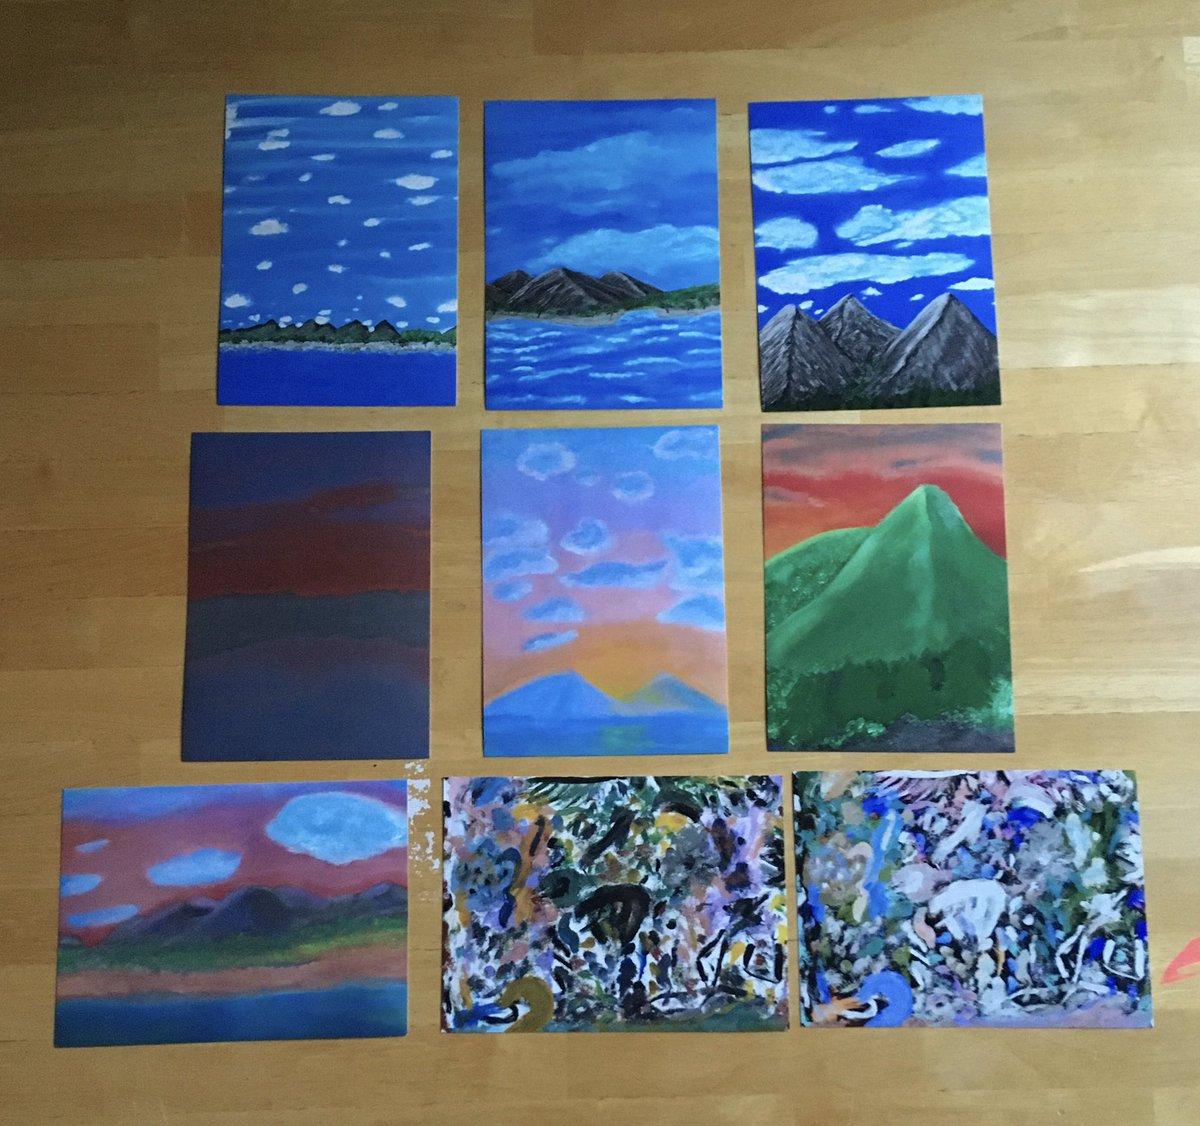 @veecstudio Hi! My 4x6 prints and stickers are under $10 😊